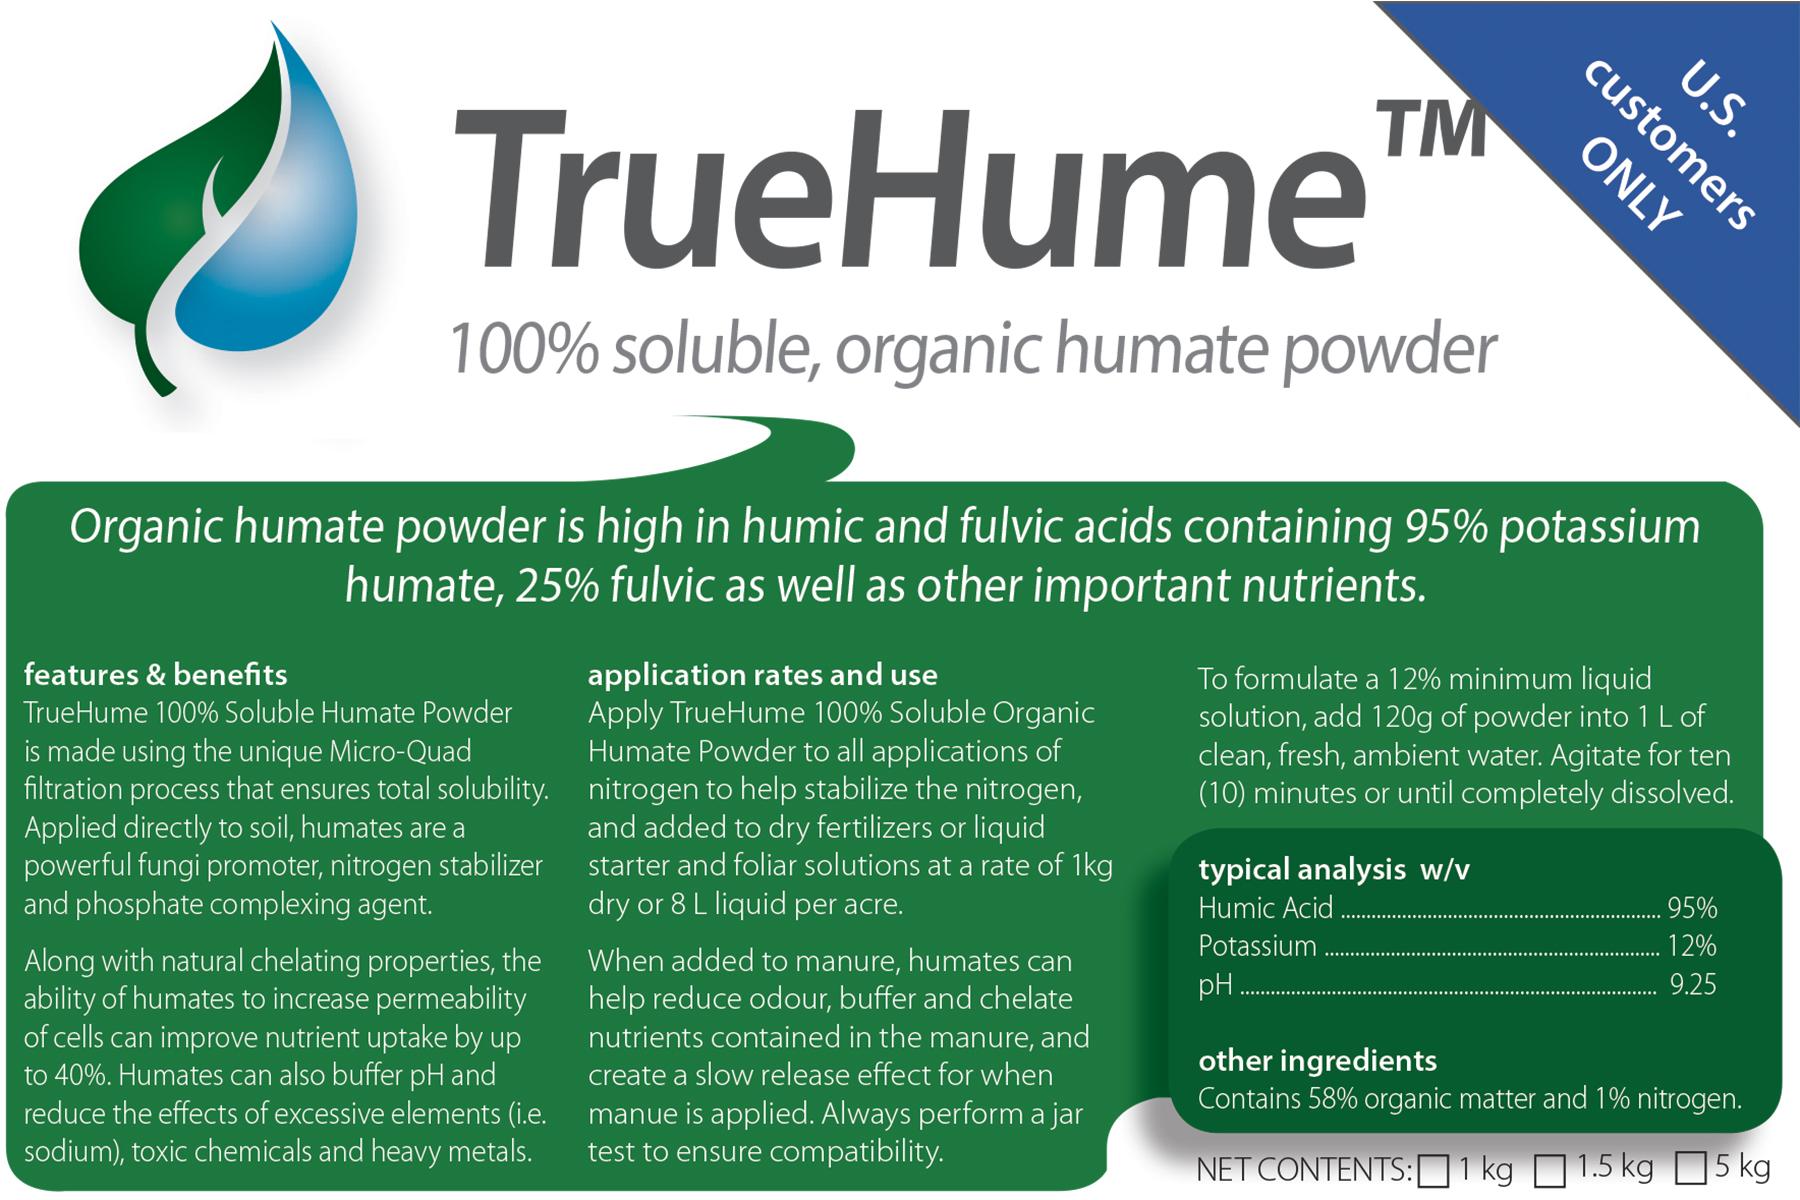 TrueHume Organic Soluble Humate Powder